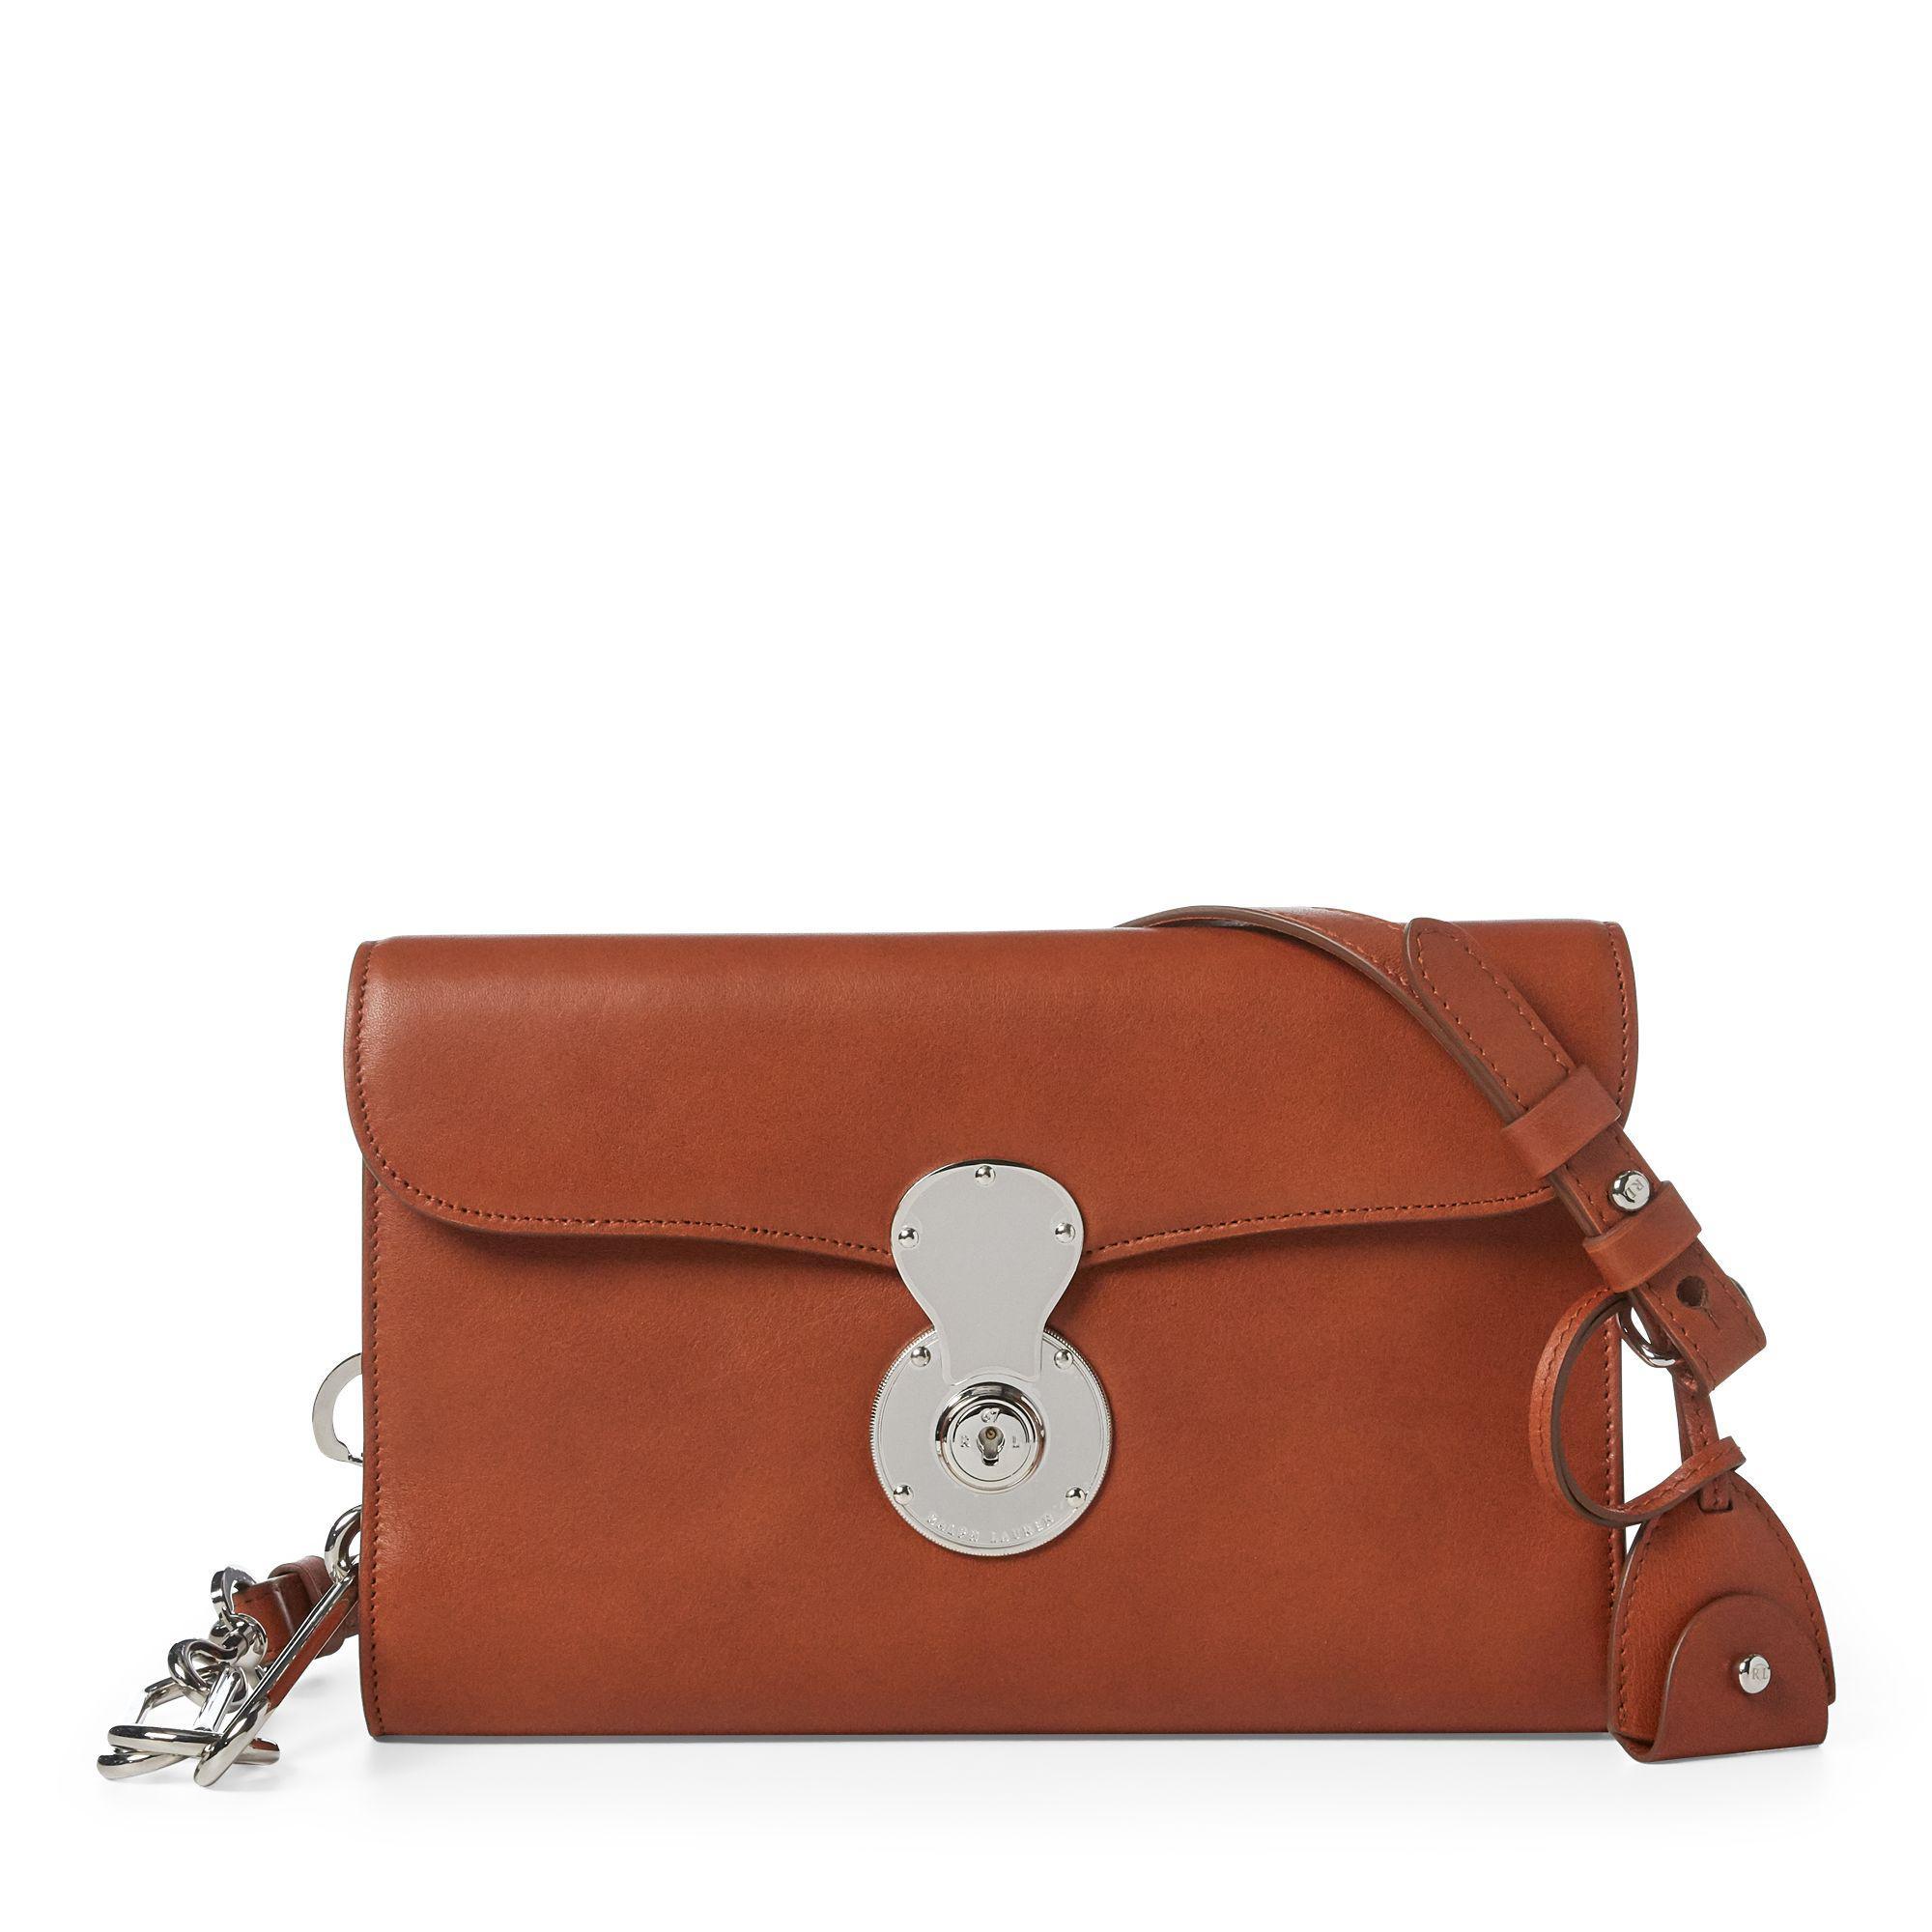 a2231ebf4b2f Ralph Lauren Leather Ricky Crossbody Bag in Brown - Lyst